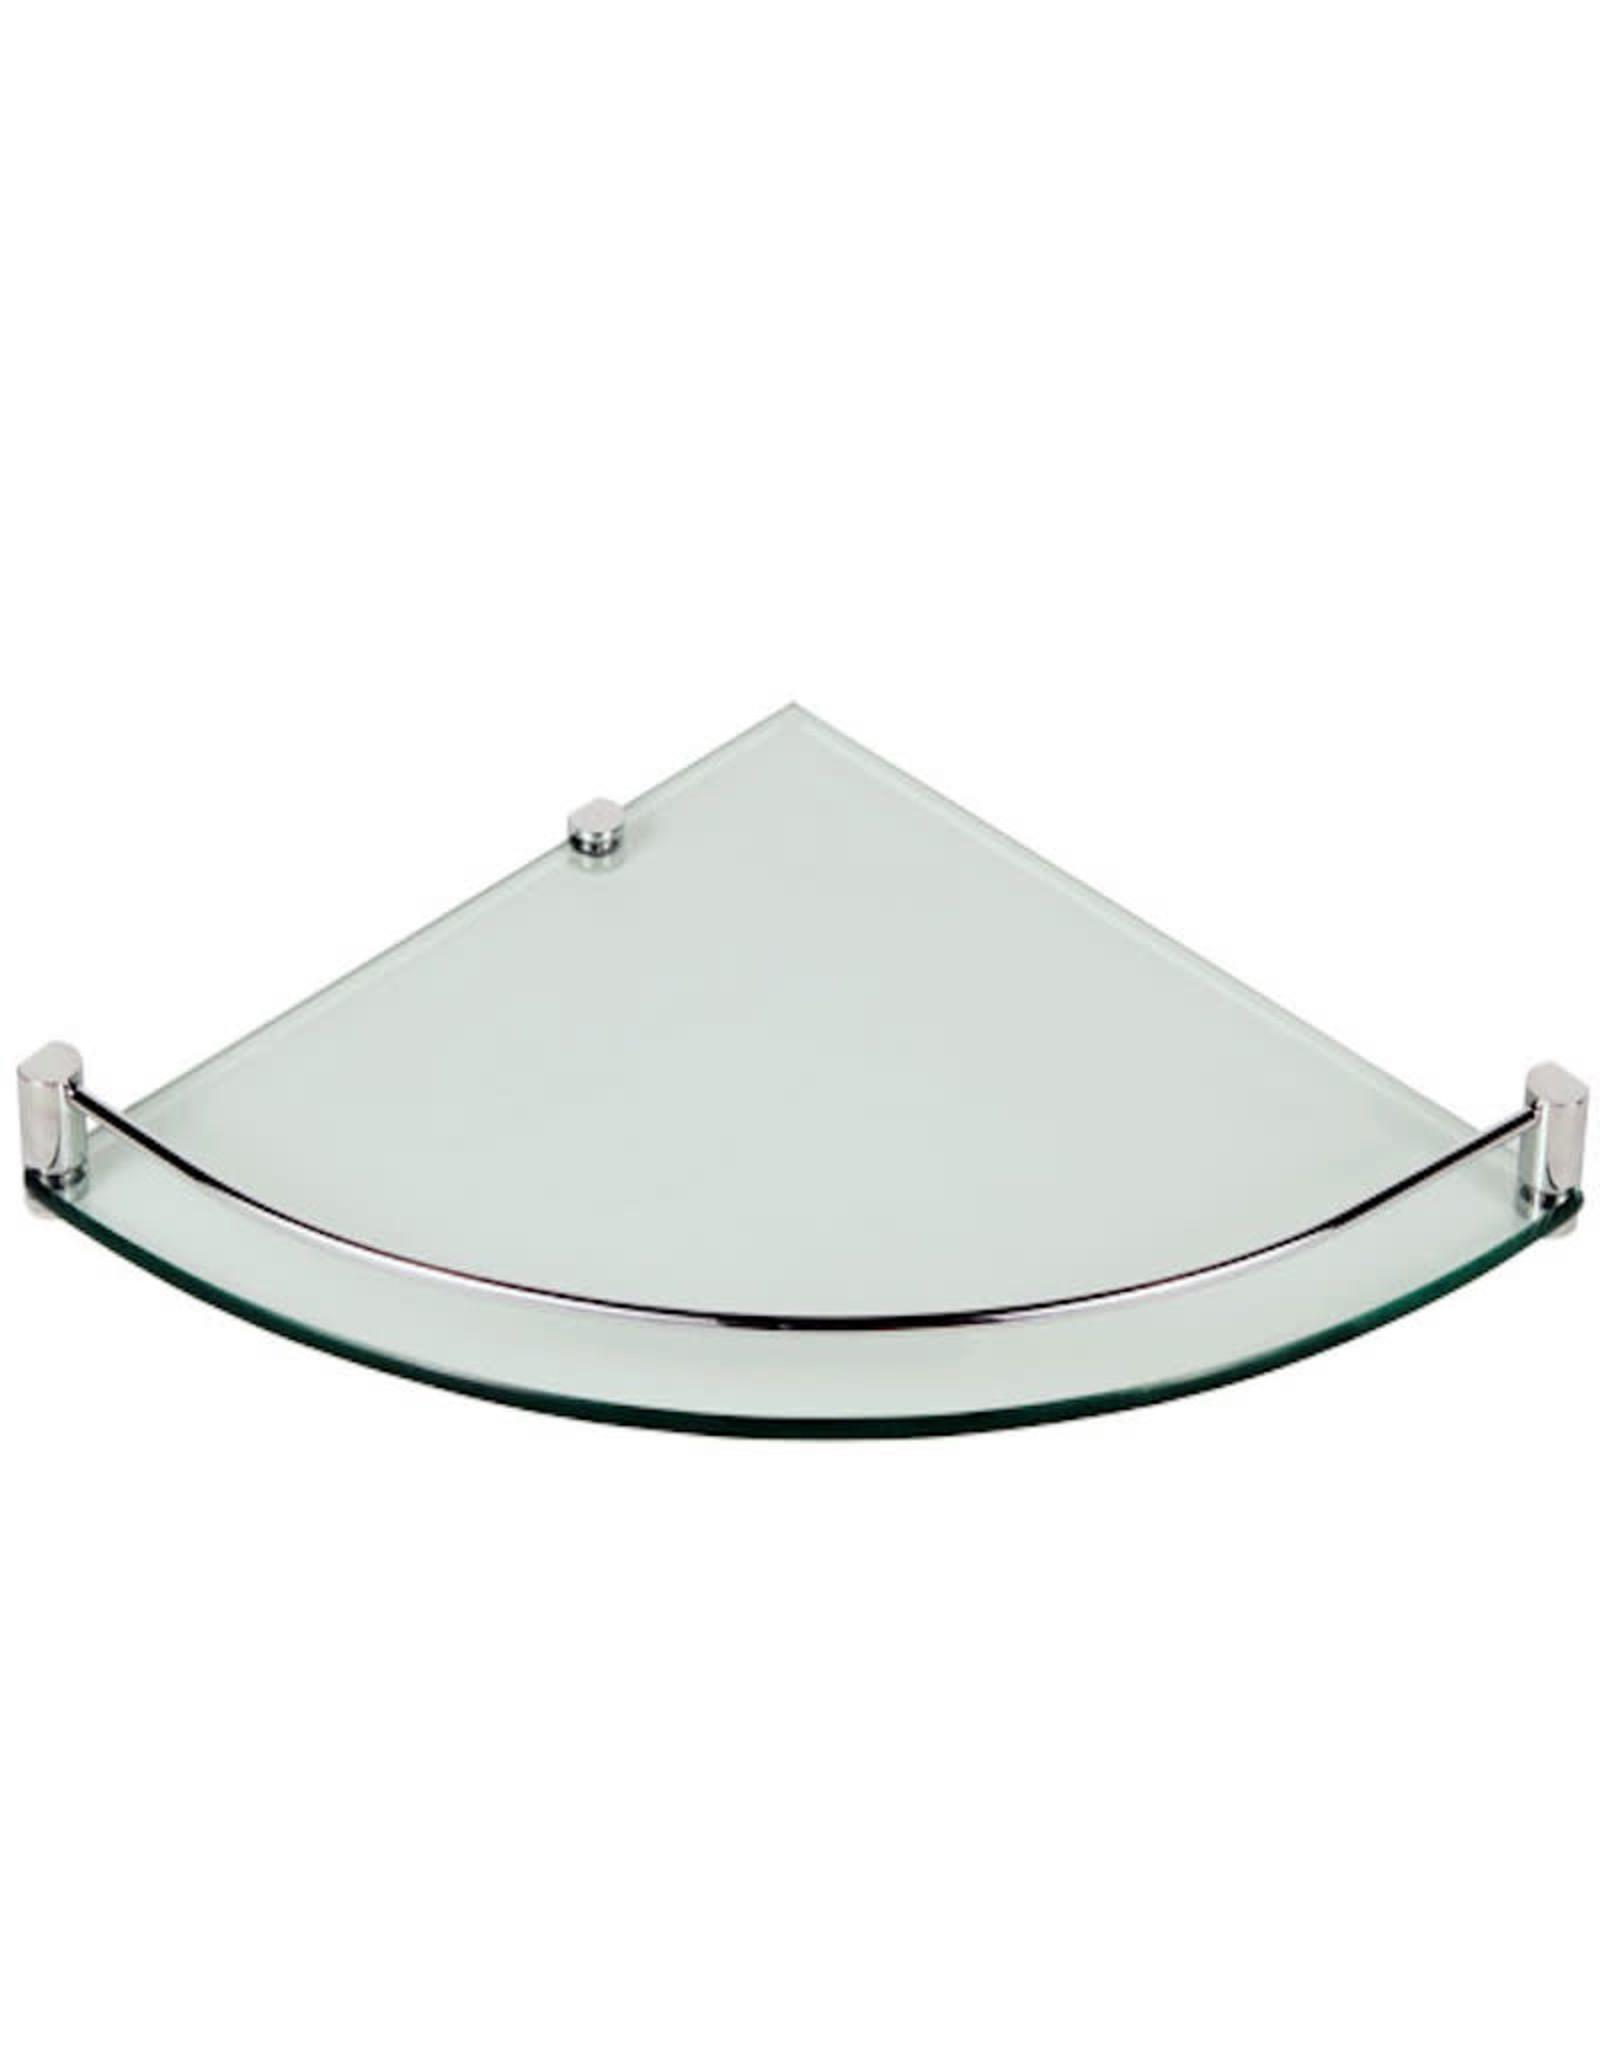 LalOO Laloo Corner Glass Shelf